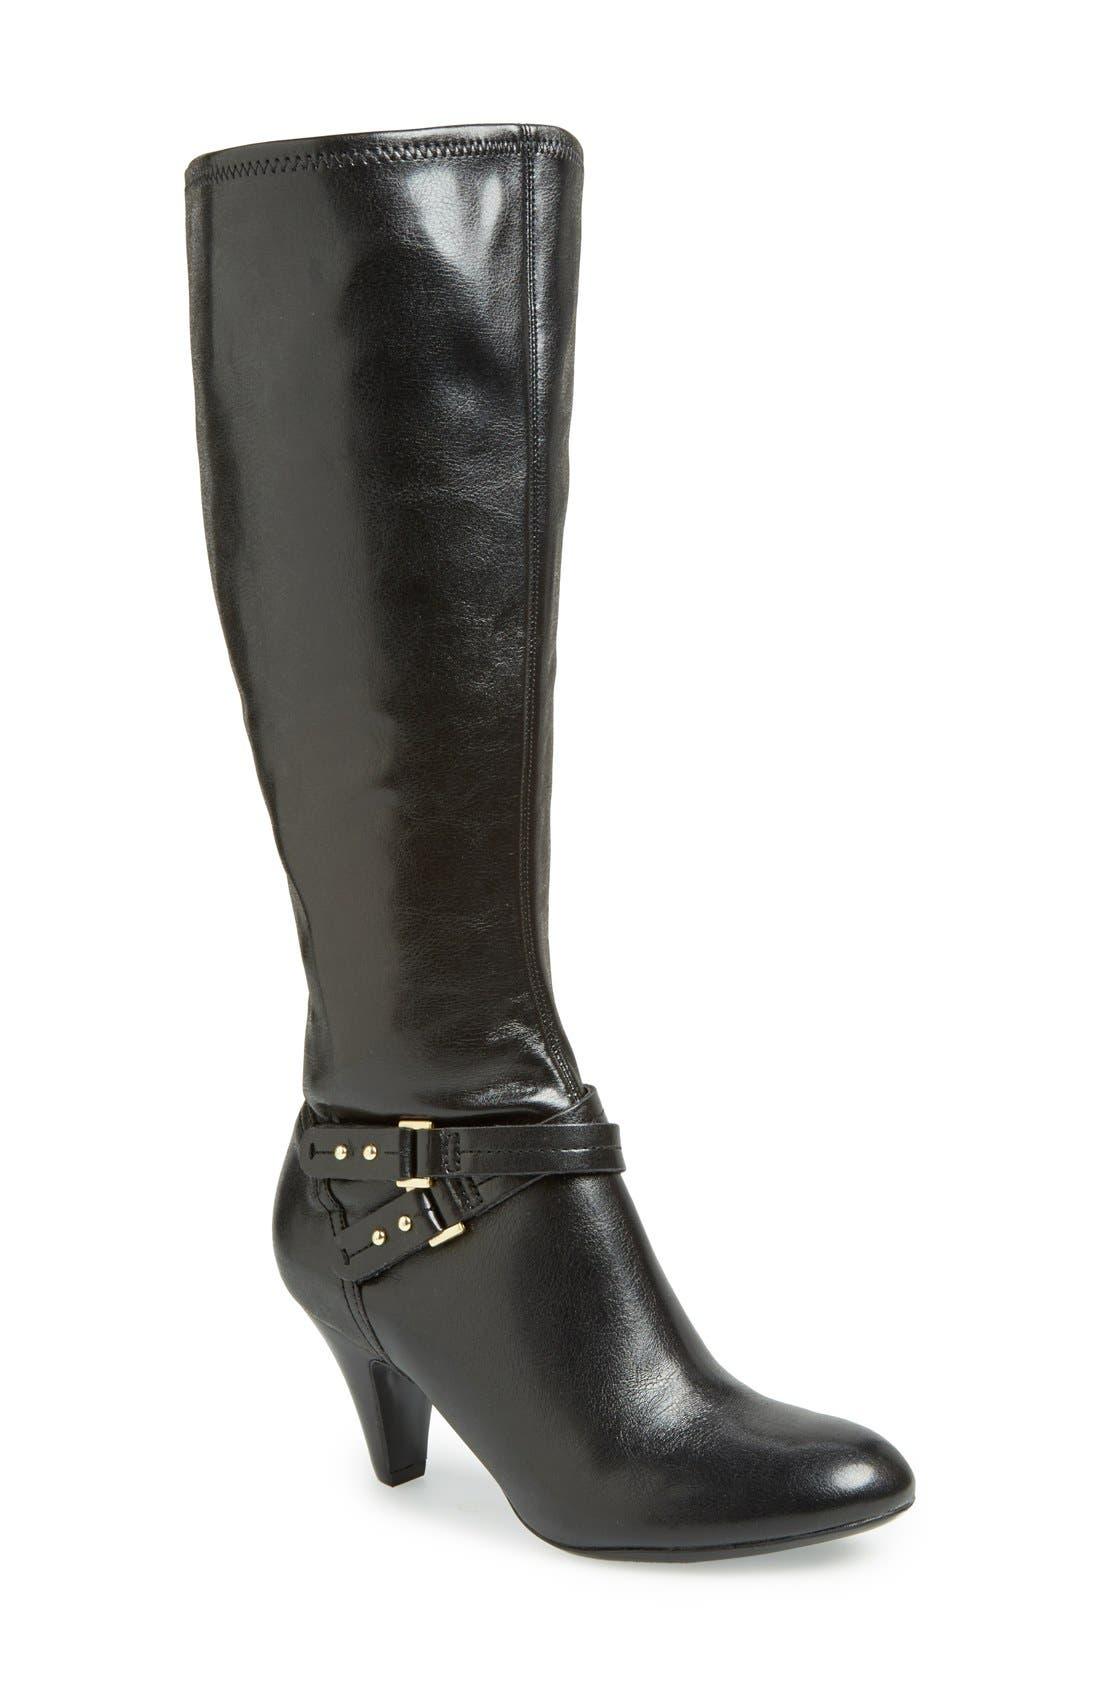 Main Image - Naturalizer 'Byron' Knee High Boot (Women)(Wide Calf)